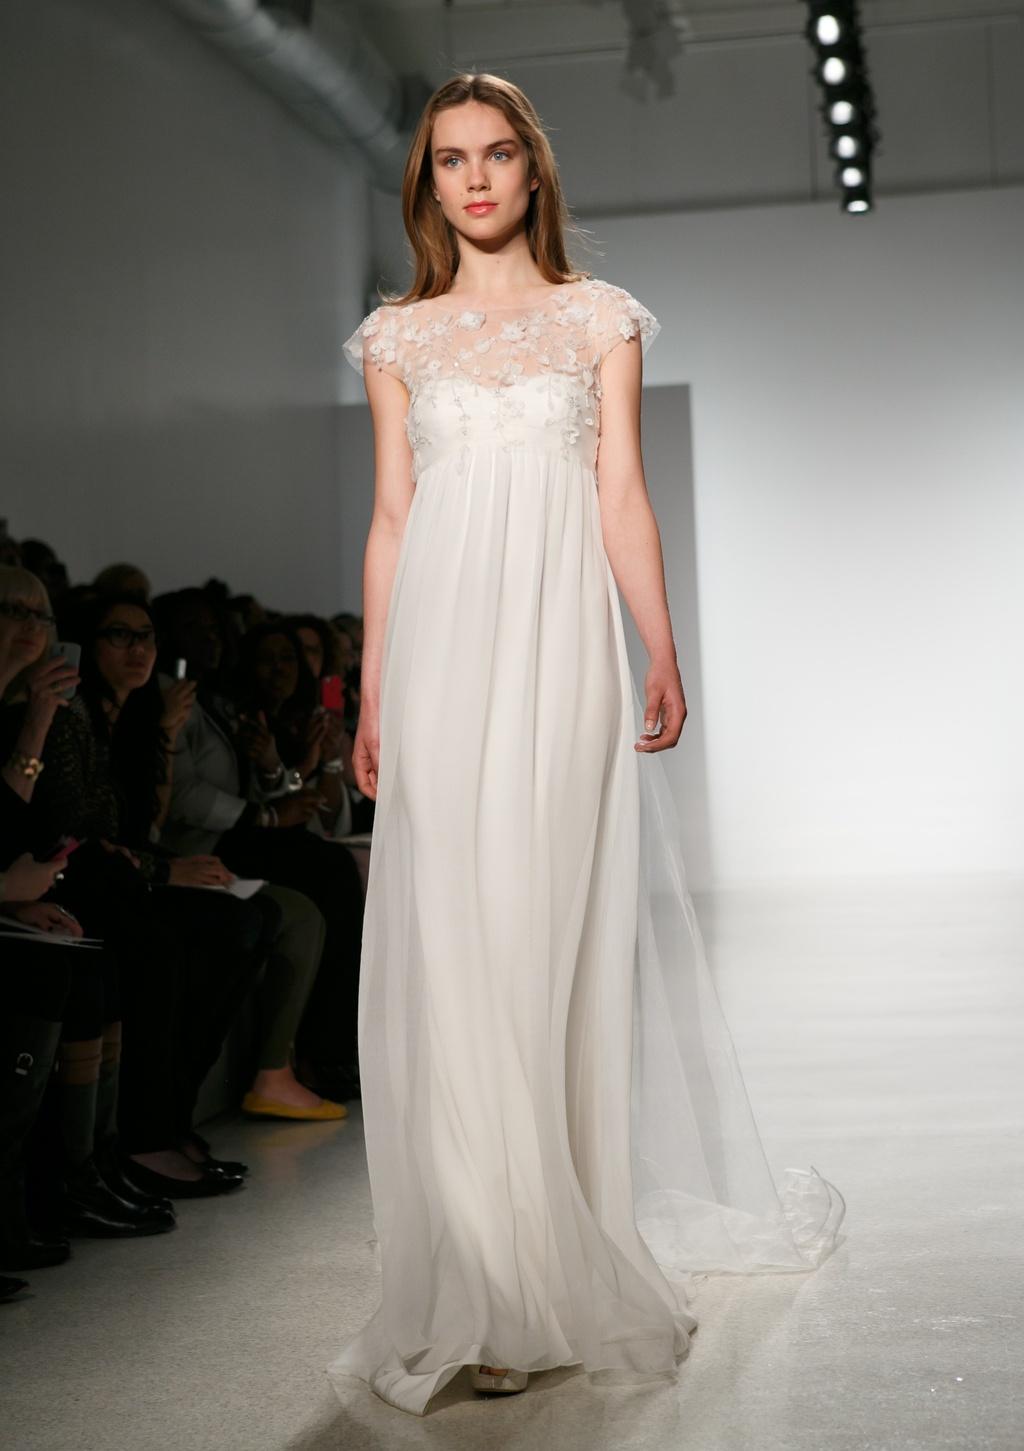 Christos-wedding-dress-spring-2014-bridal-4.full